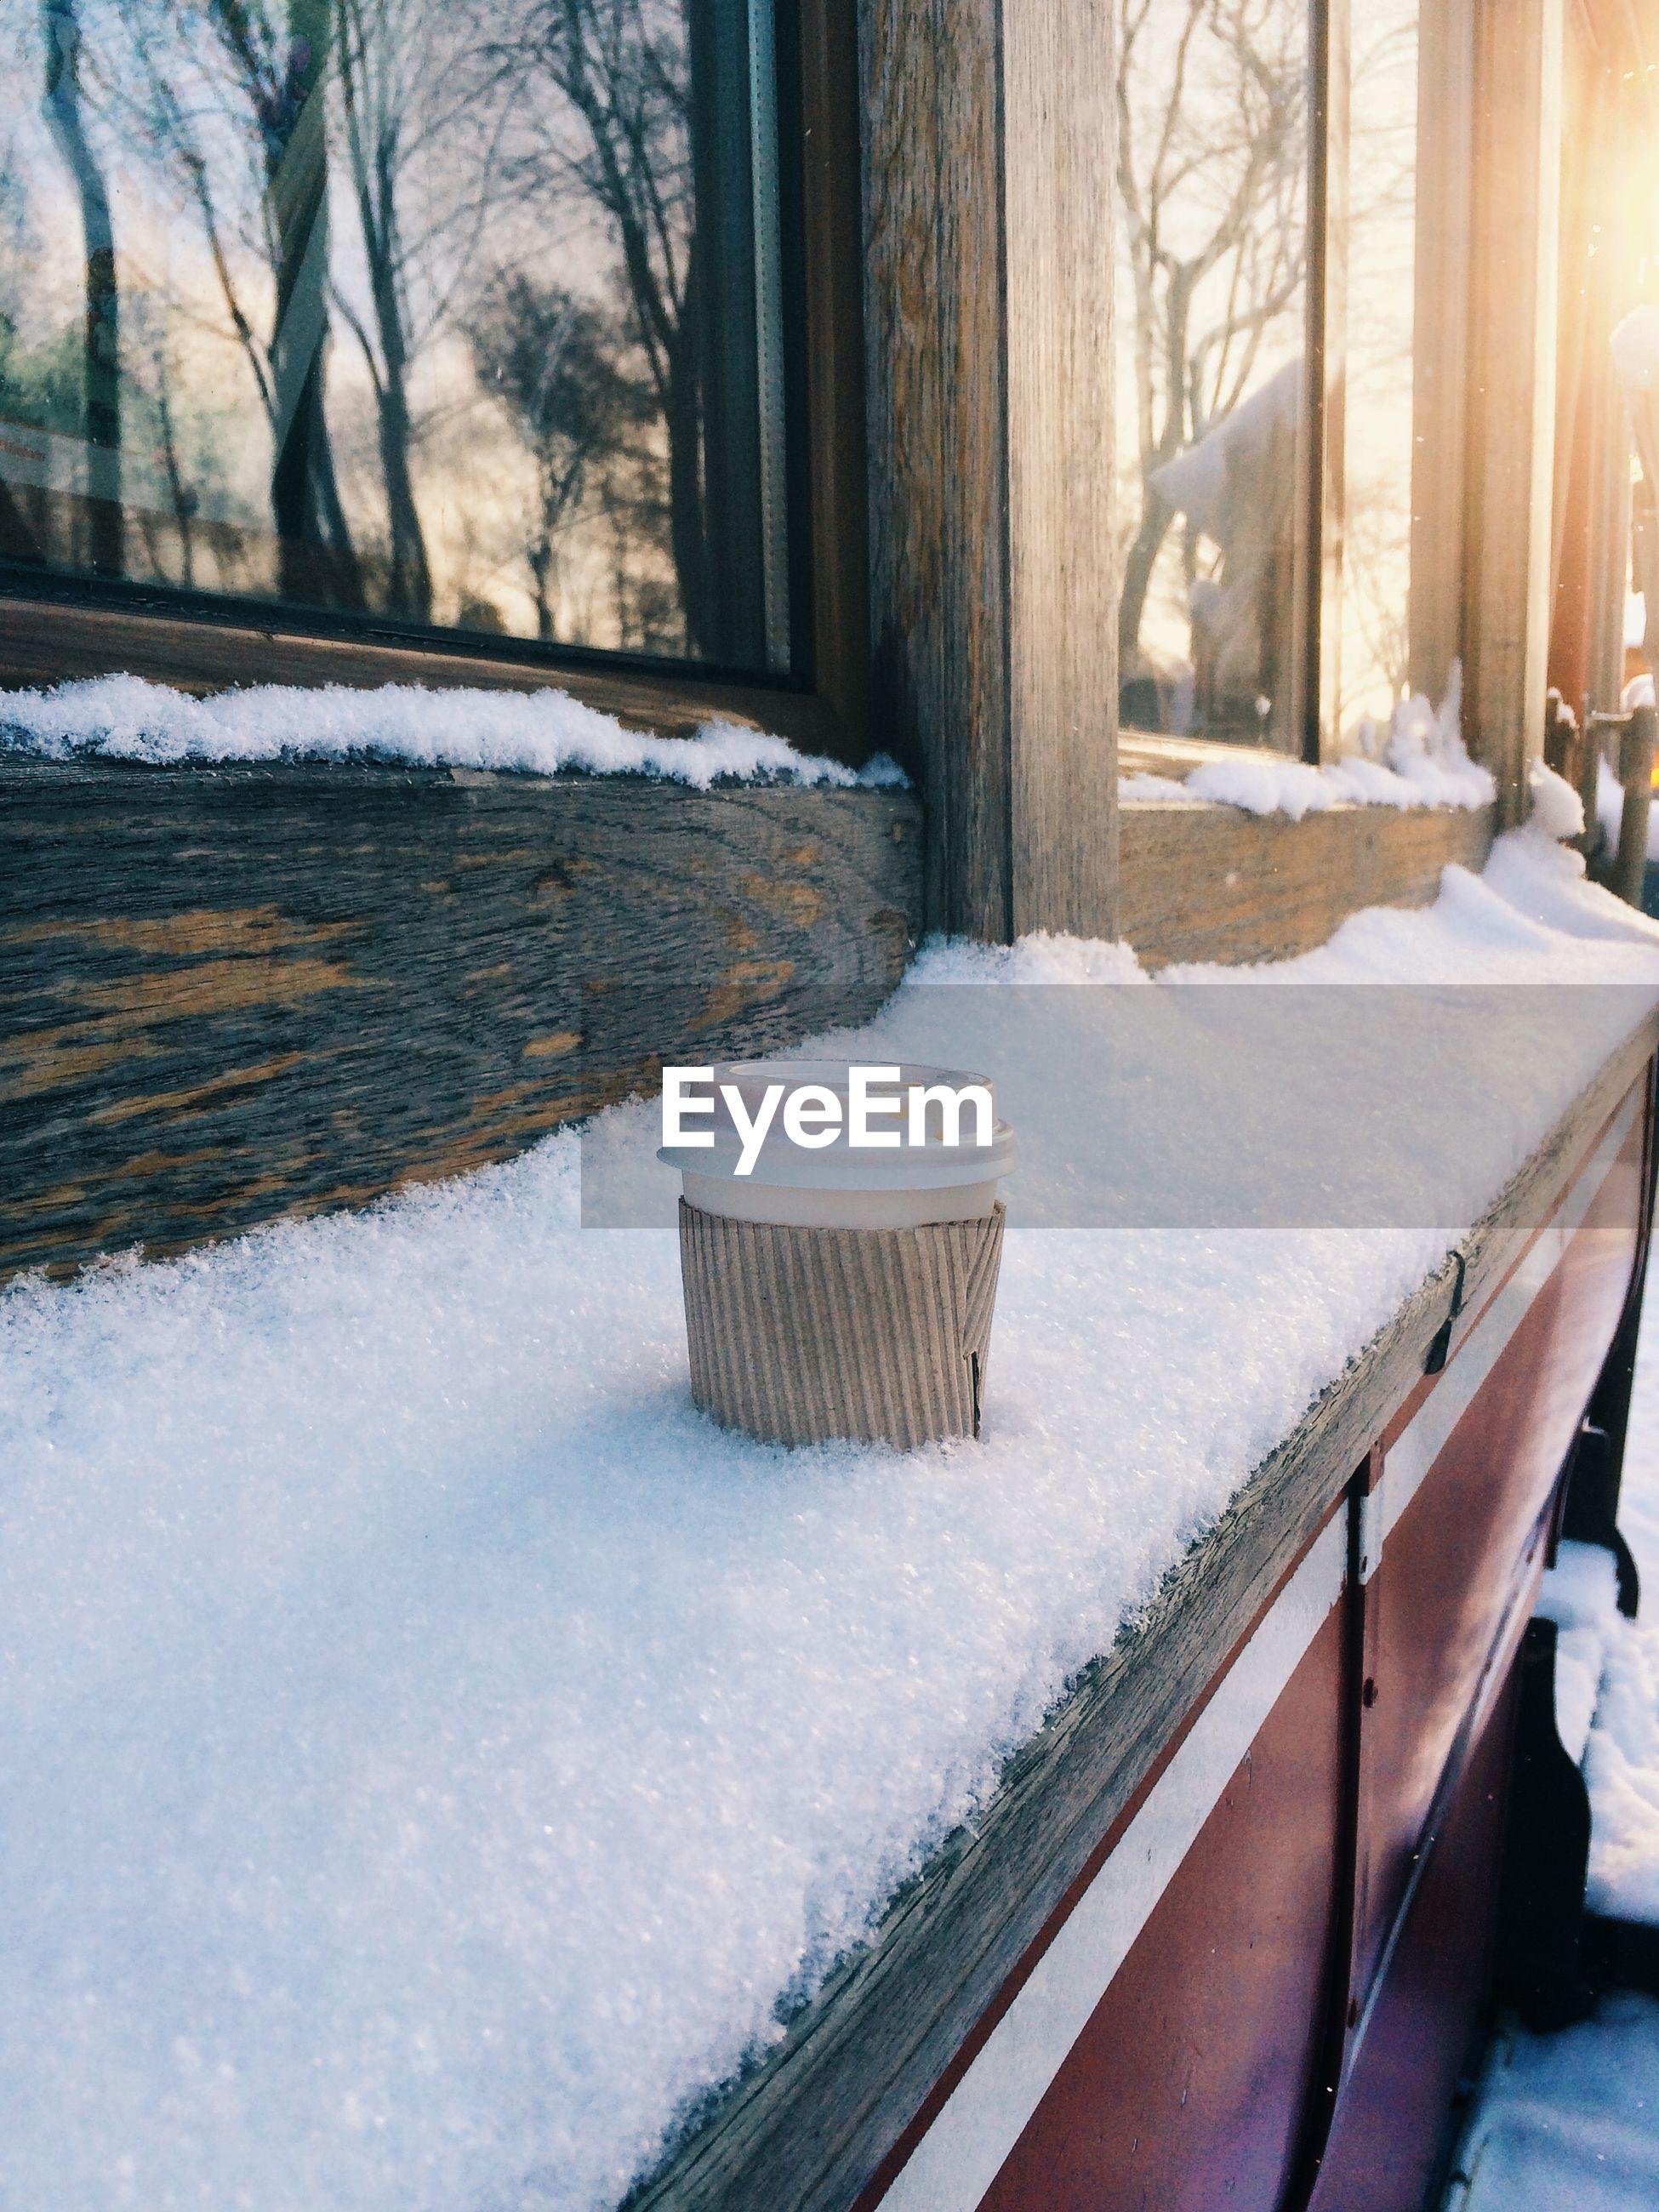 Close-up of snow on window sill